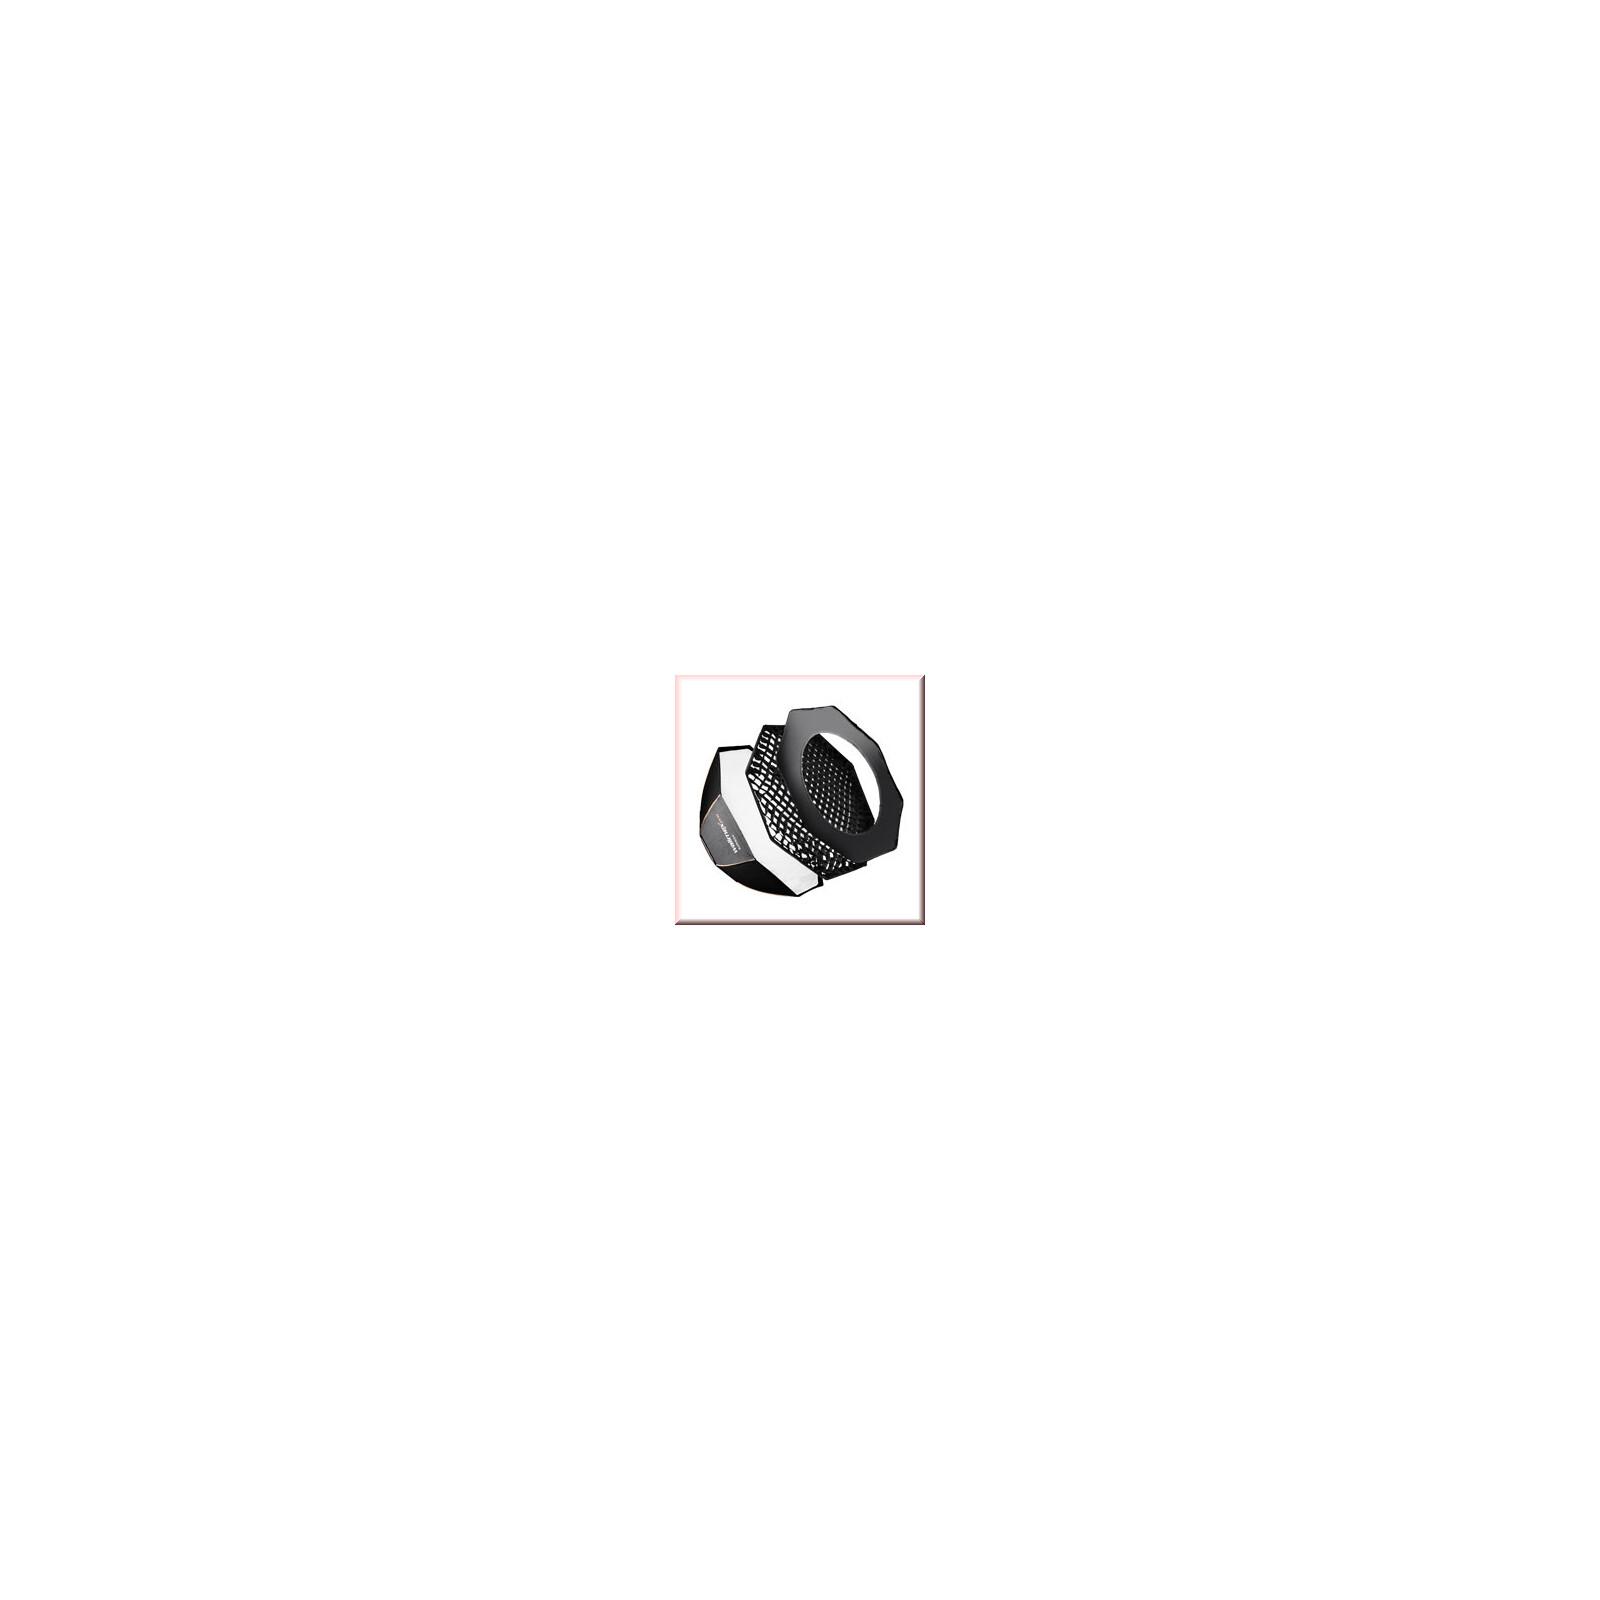 walimex pro Octa Softbox PLUS OL Ø170 Auro/Bowens